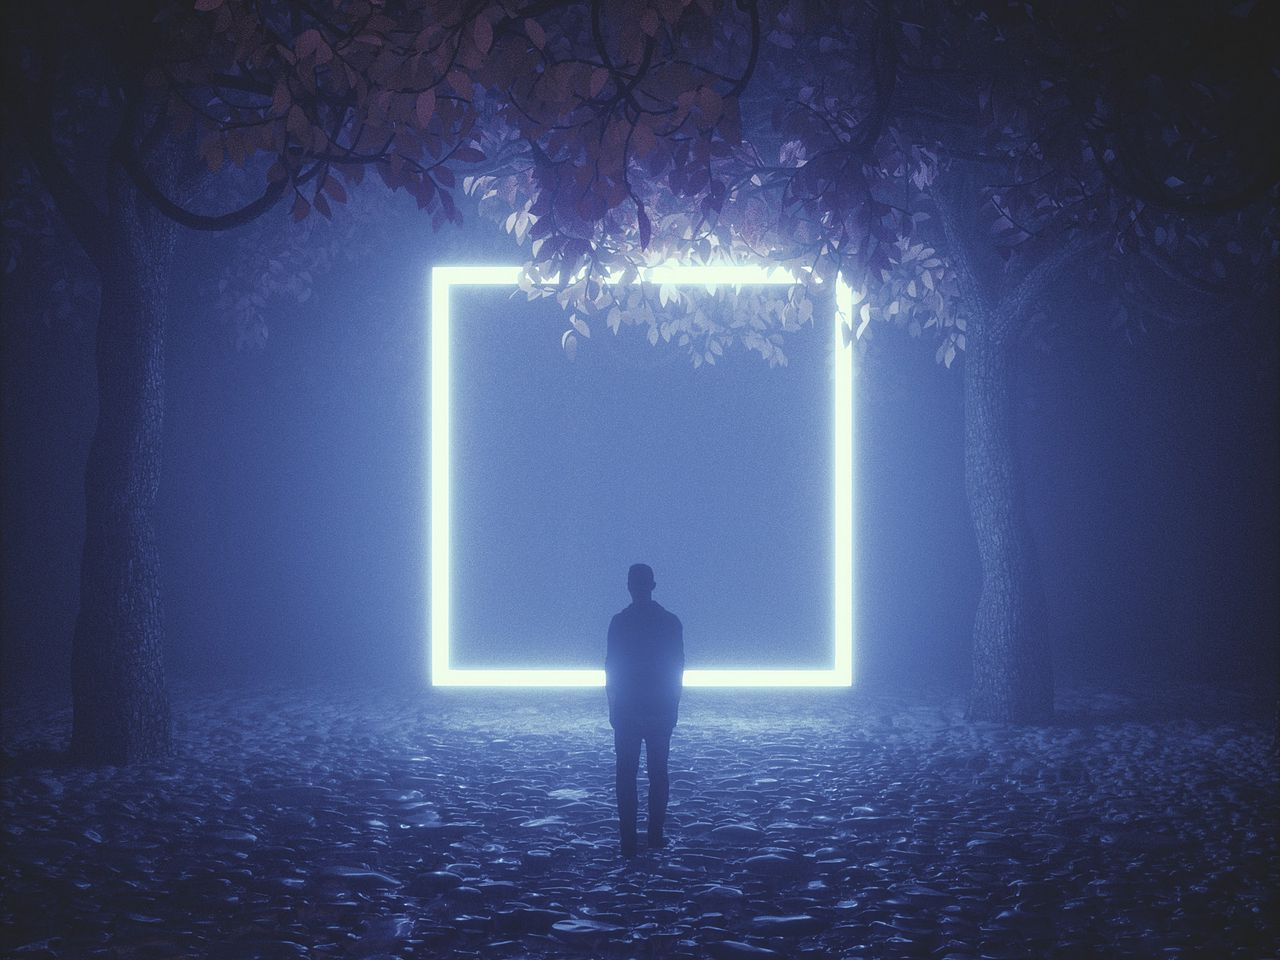 1280x960 Wallpaper silhouette, cube, neon, trees